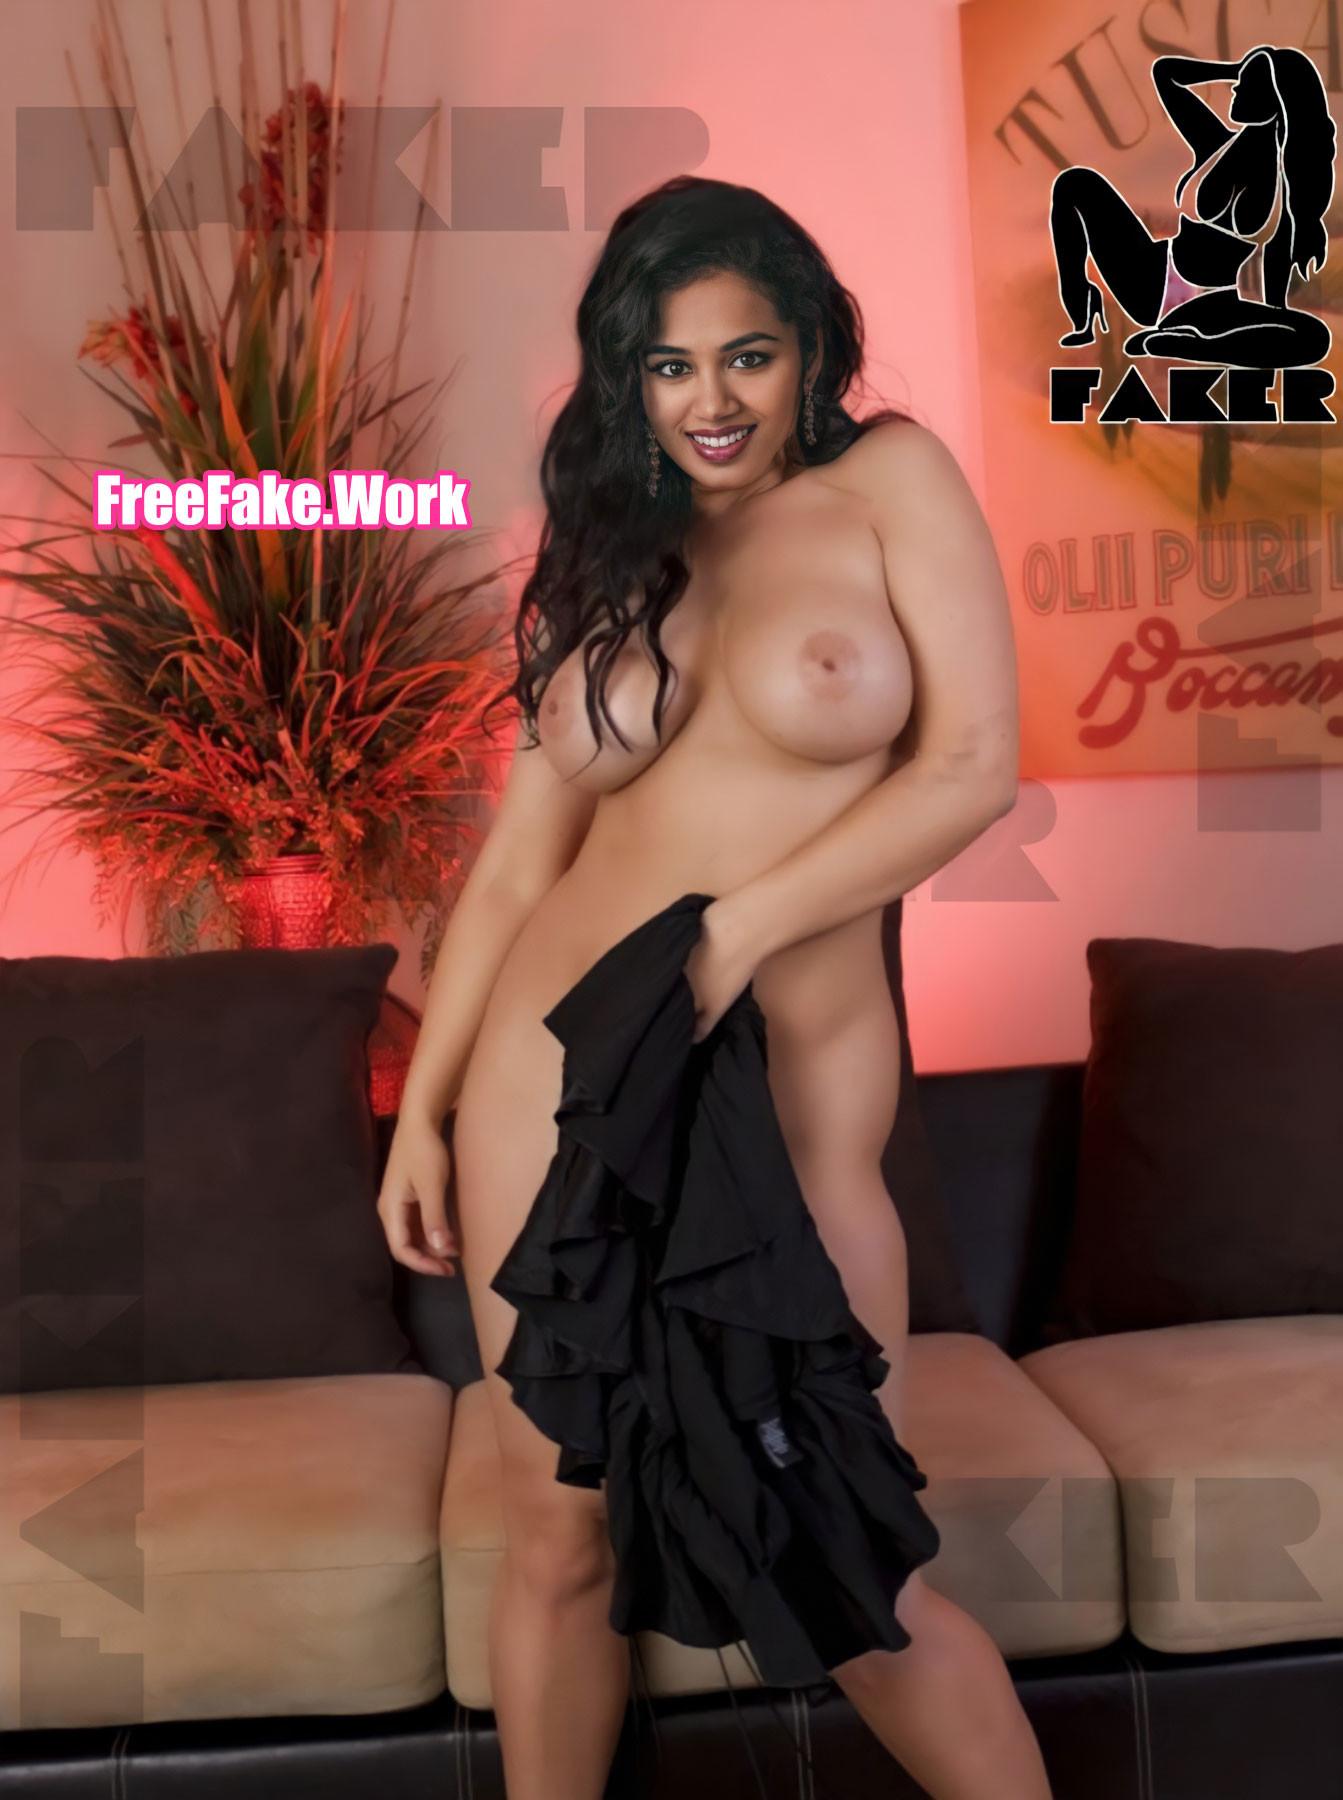 Full-Nude-Manisha-Eerabathini-covering-her-naked-pussy-photo-com.jpg